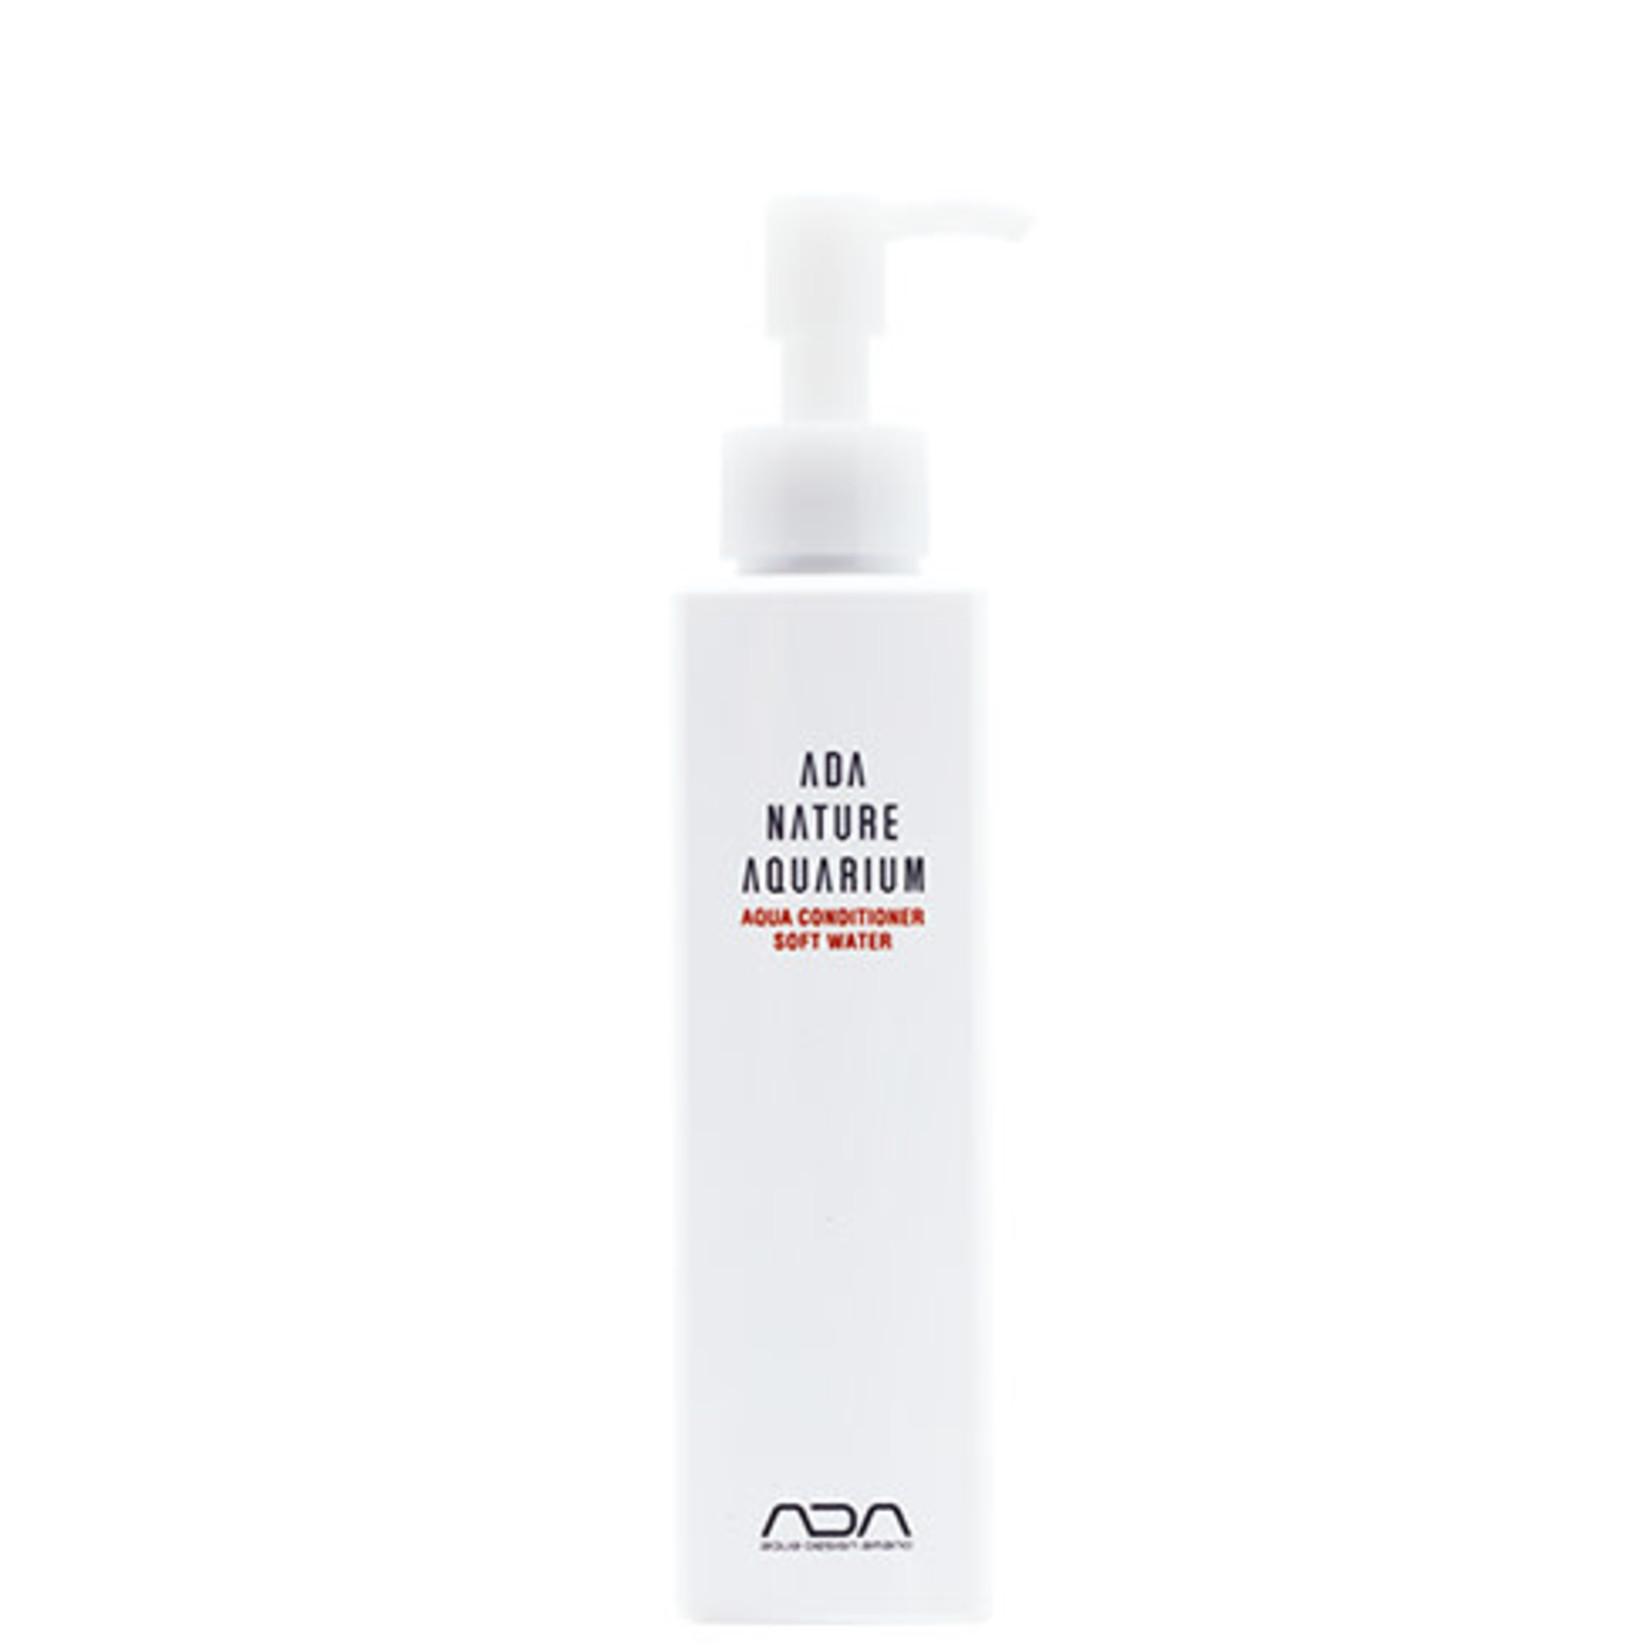 ADA Aqua Conditioner Soft Water